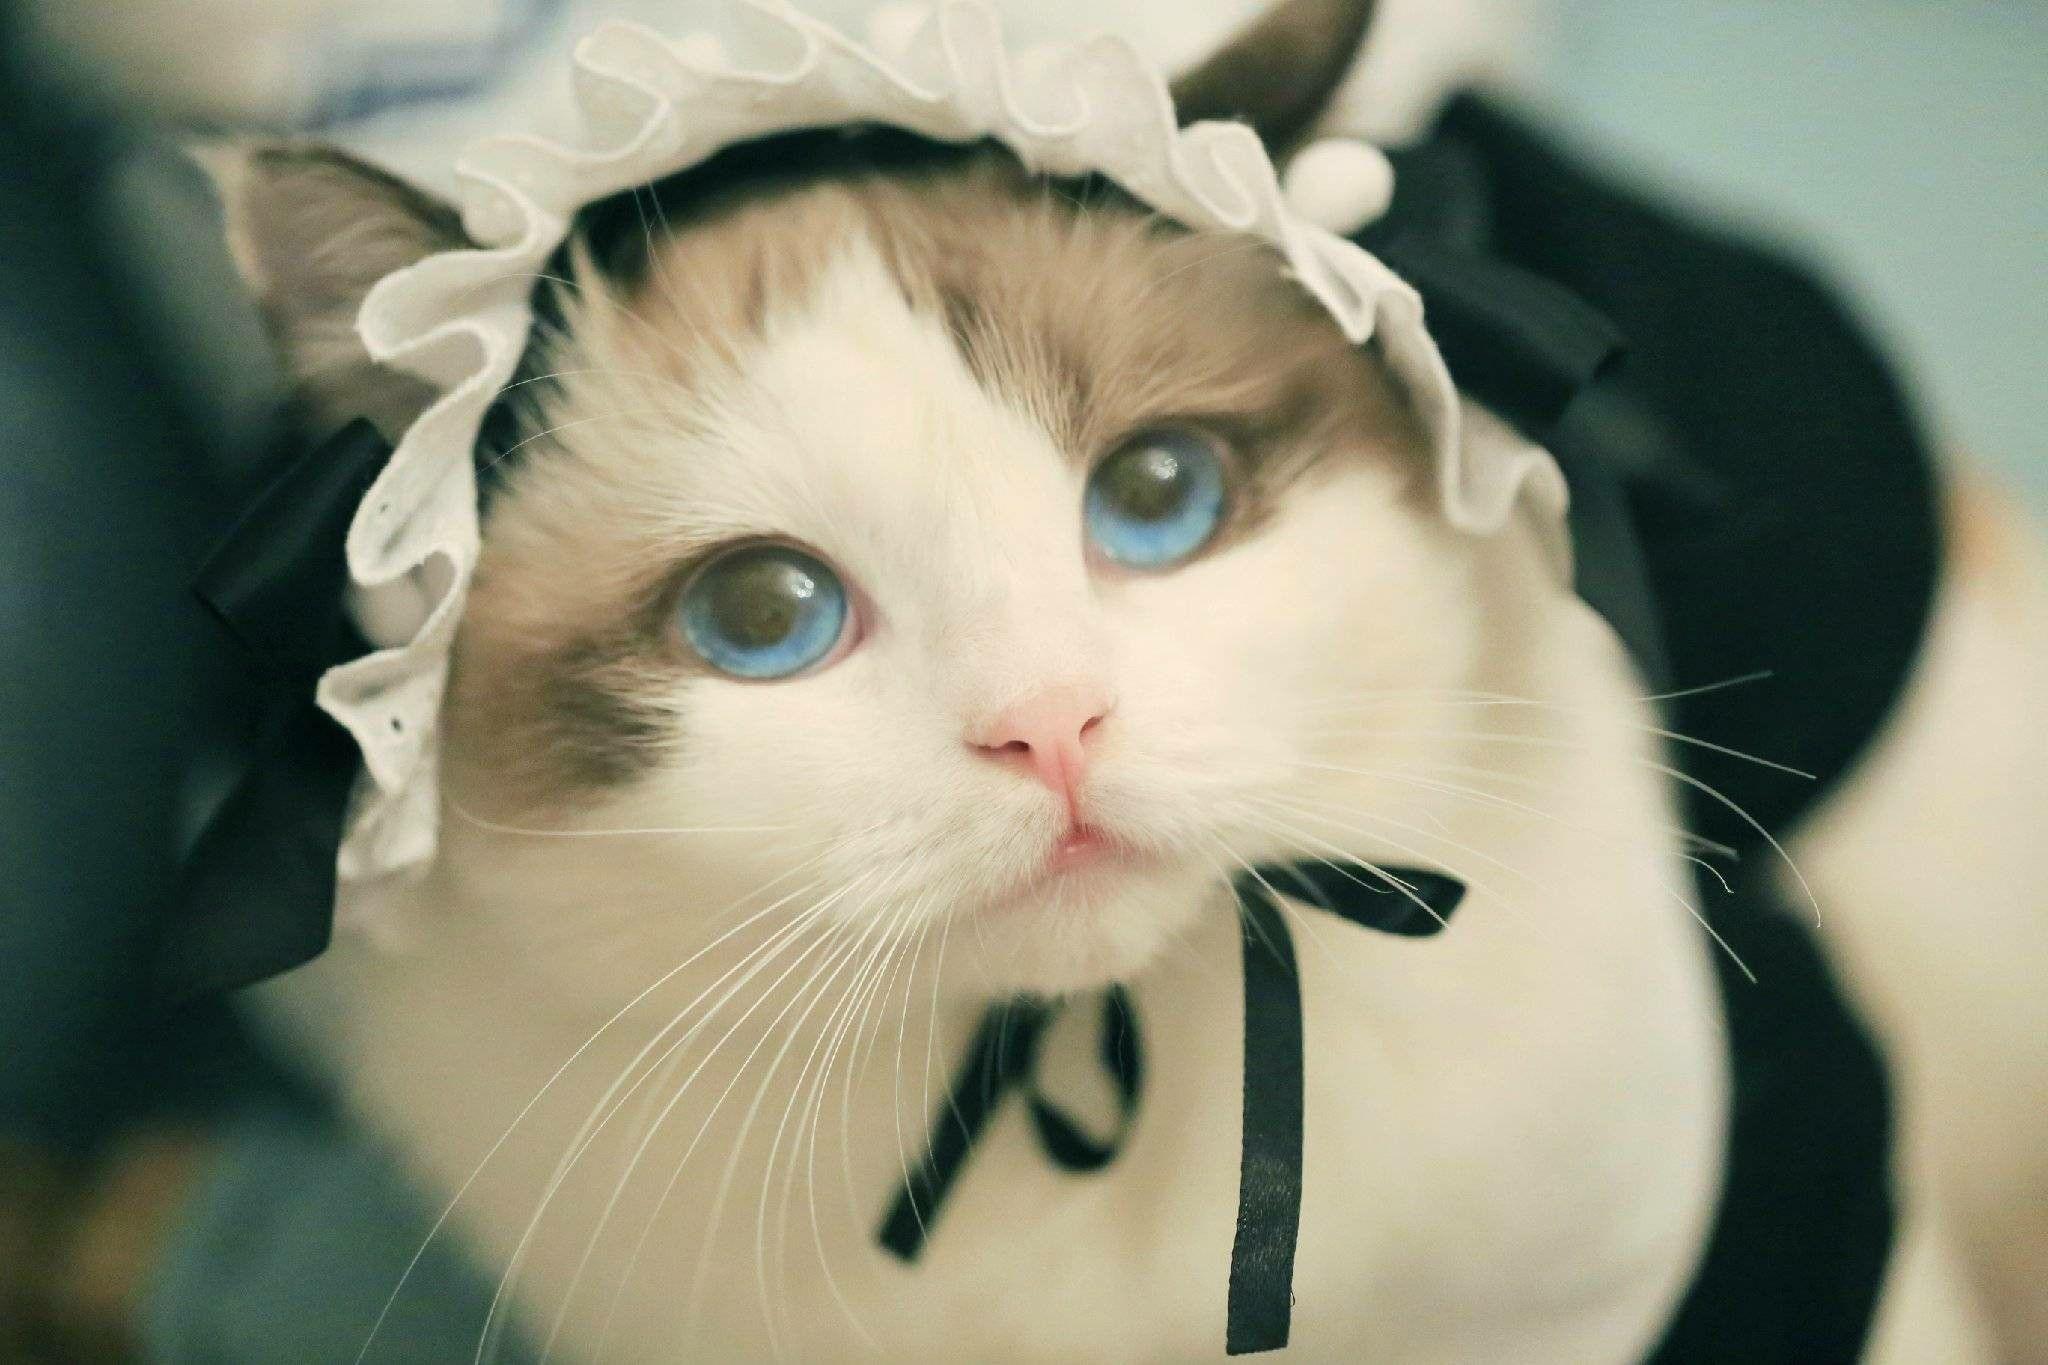 We Are Looking For Virgin Hair Distributors Worldwide Email Hezhianzhianhe Gmail Com Tel Whatsapp 86 166 0374 0829 Pet Cute Cats Cute Animal Photos Cats